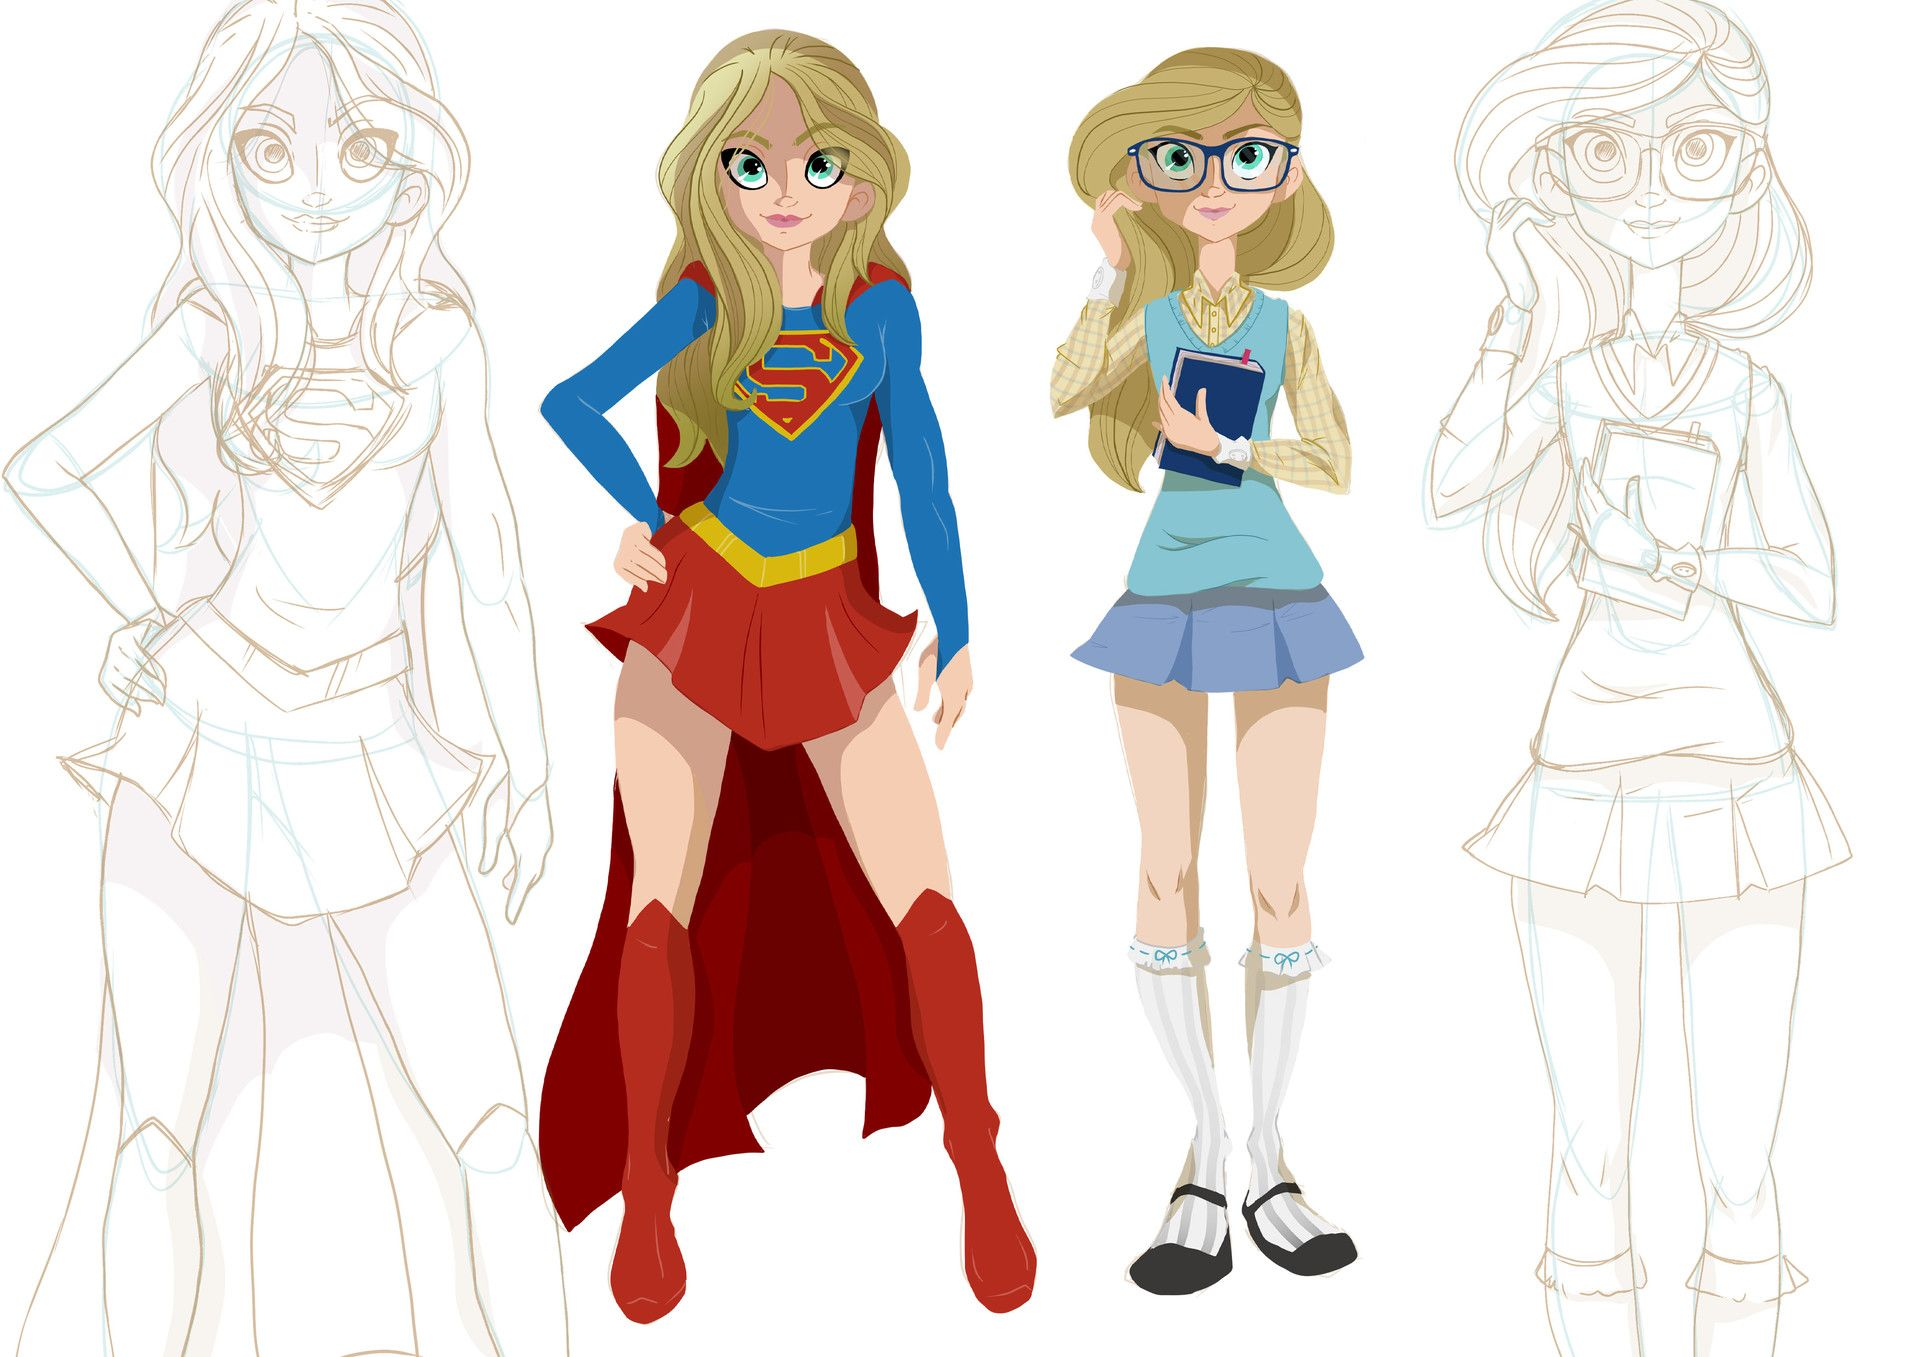 ArtStation - Kara - Supergirl, Fabiano Freitas